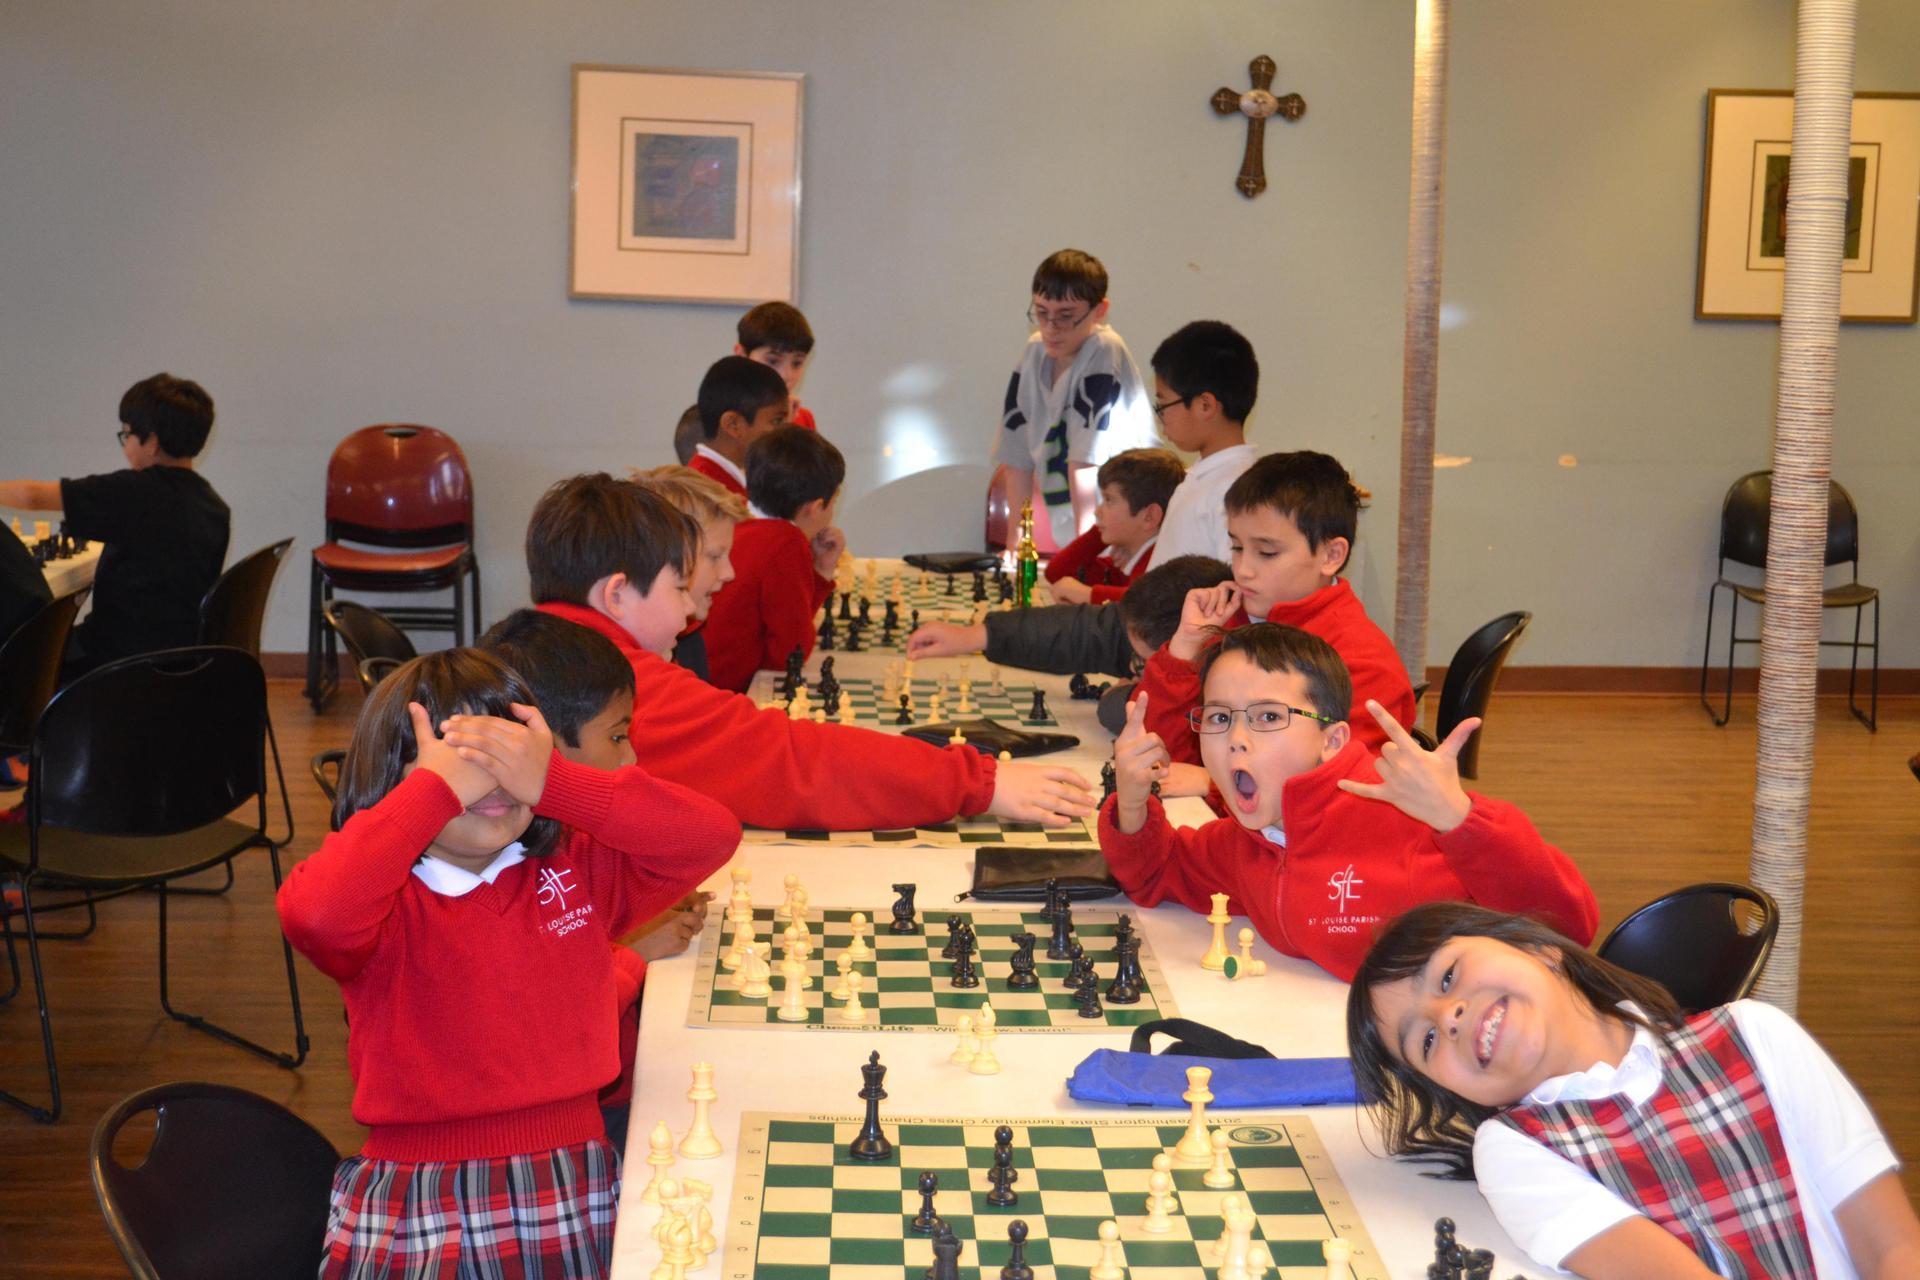 fb chess play instruction